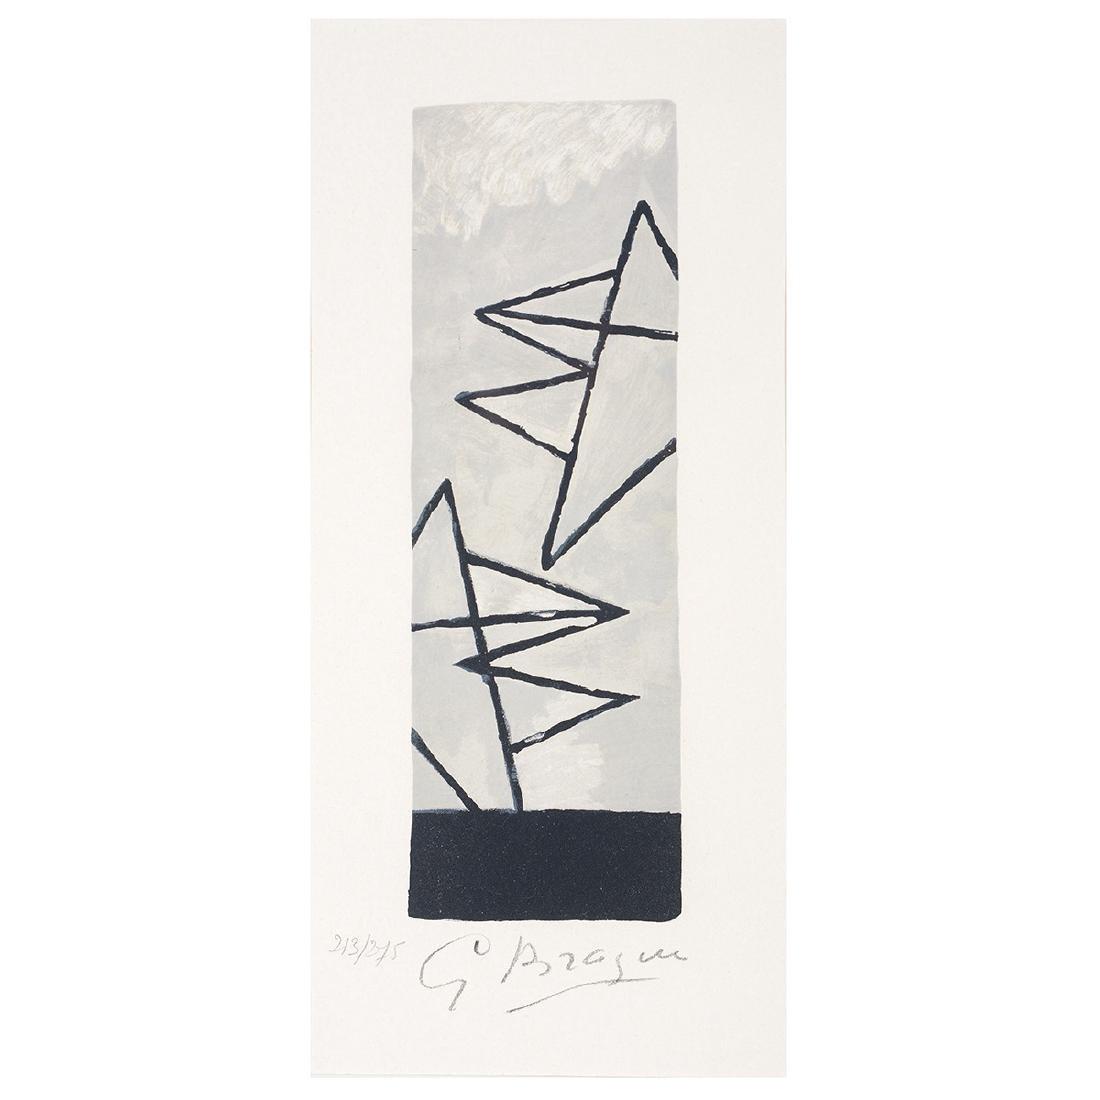 "George Braque ""Ciel Gris I"" Lithograph, signed"